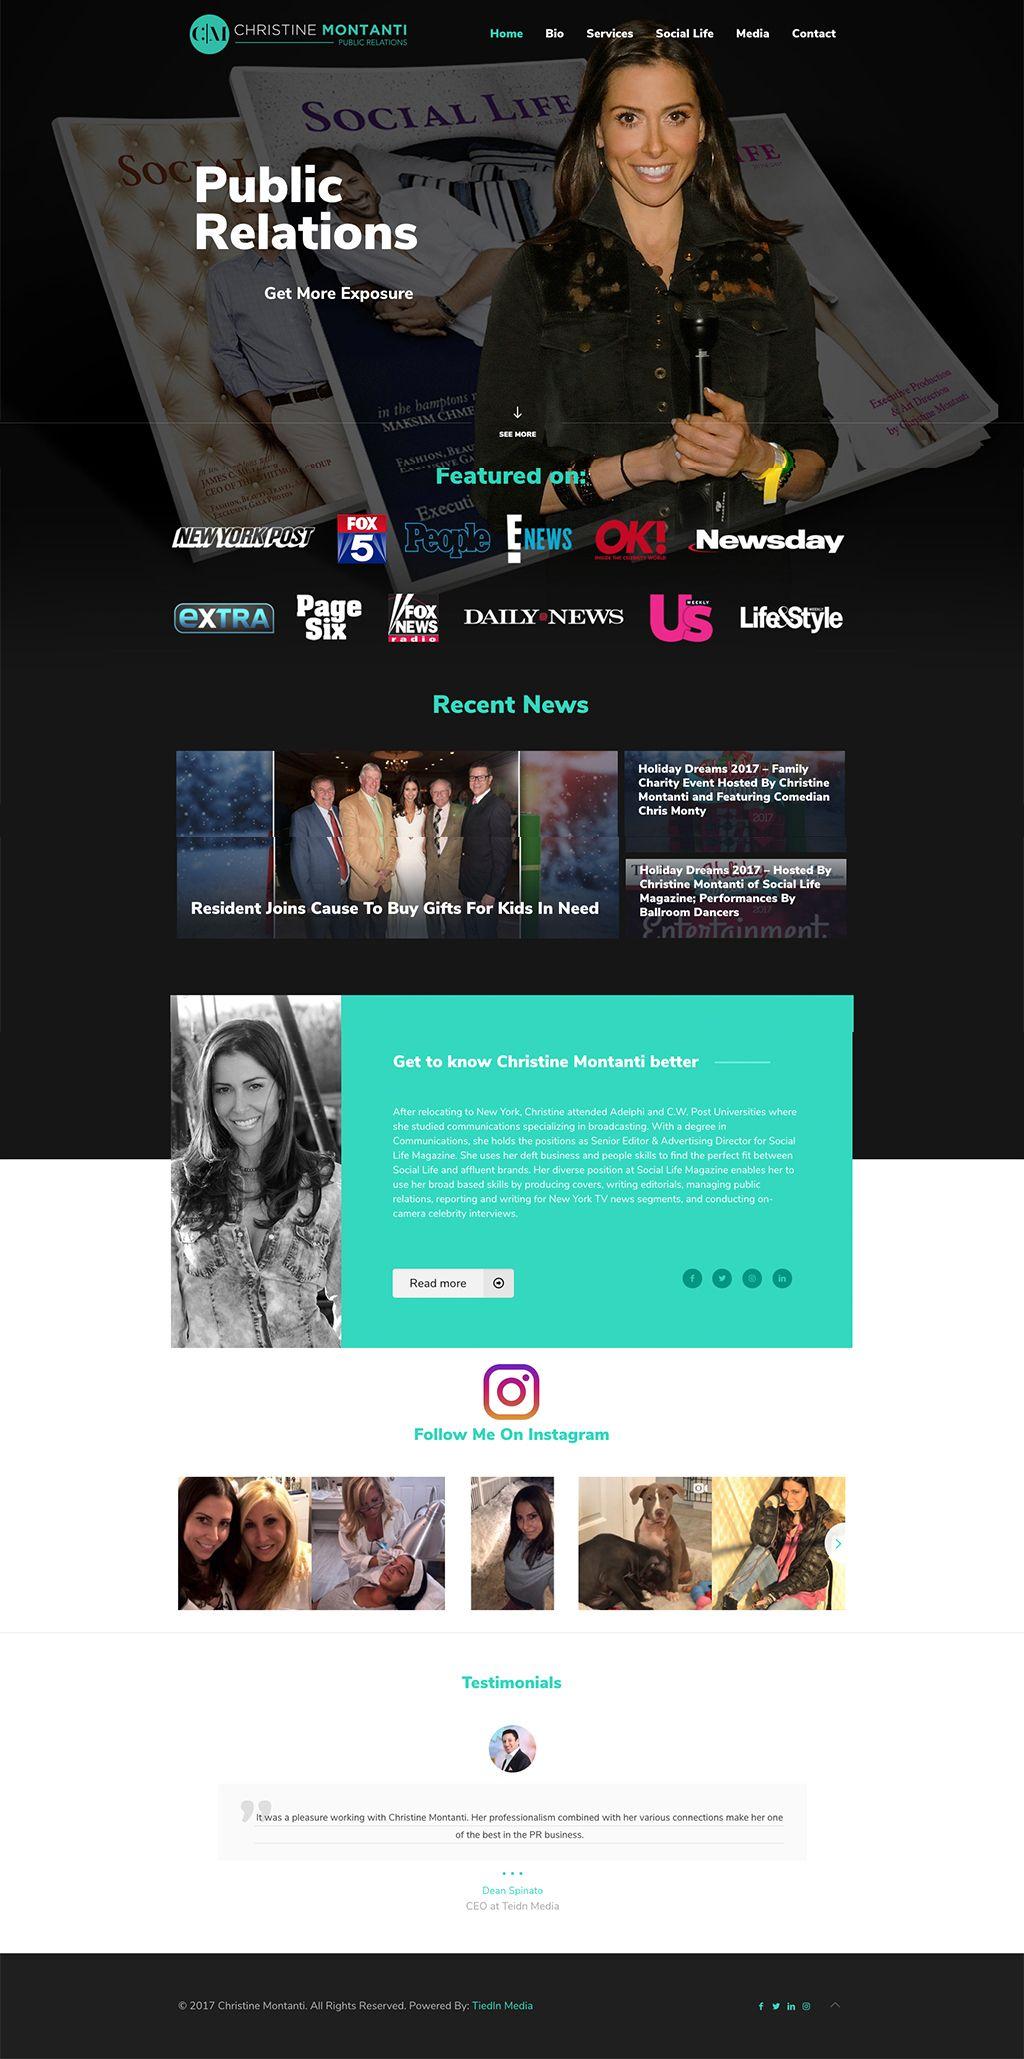 Christine Montanti TiedIn Media Marketing professional